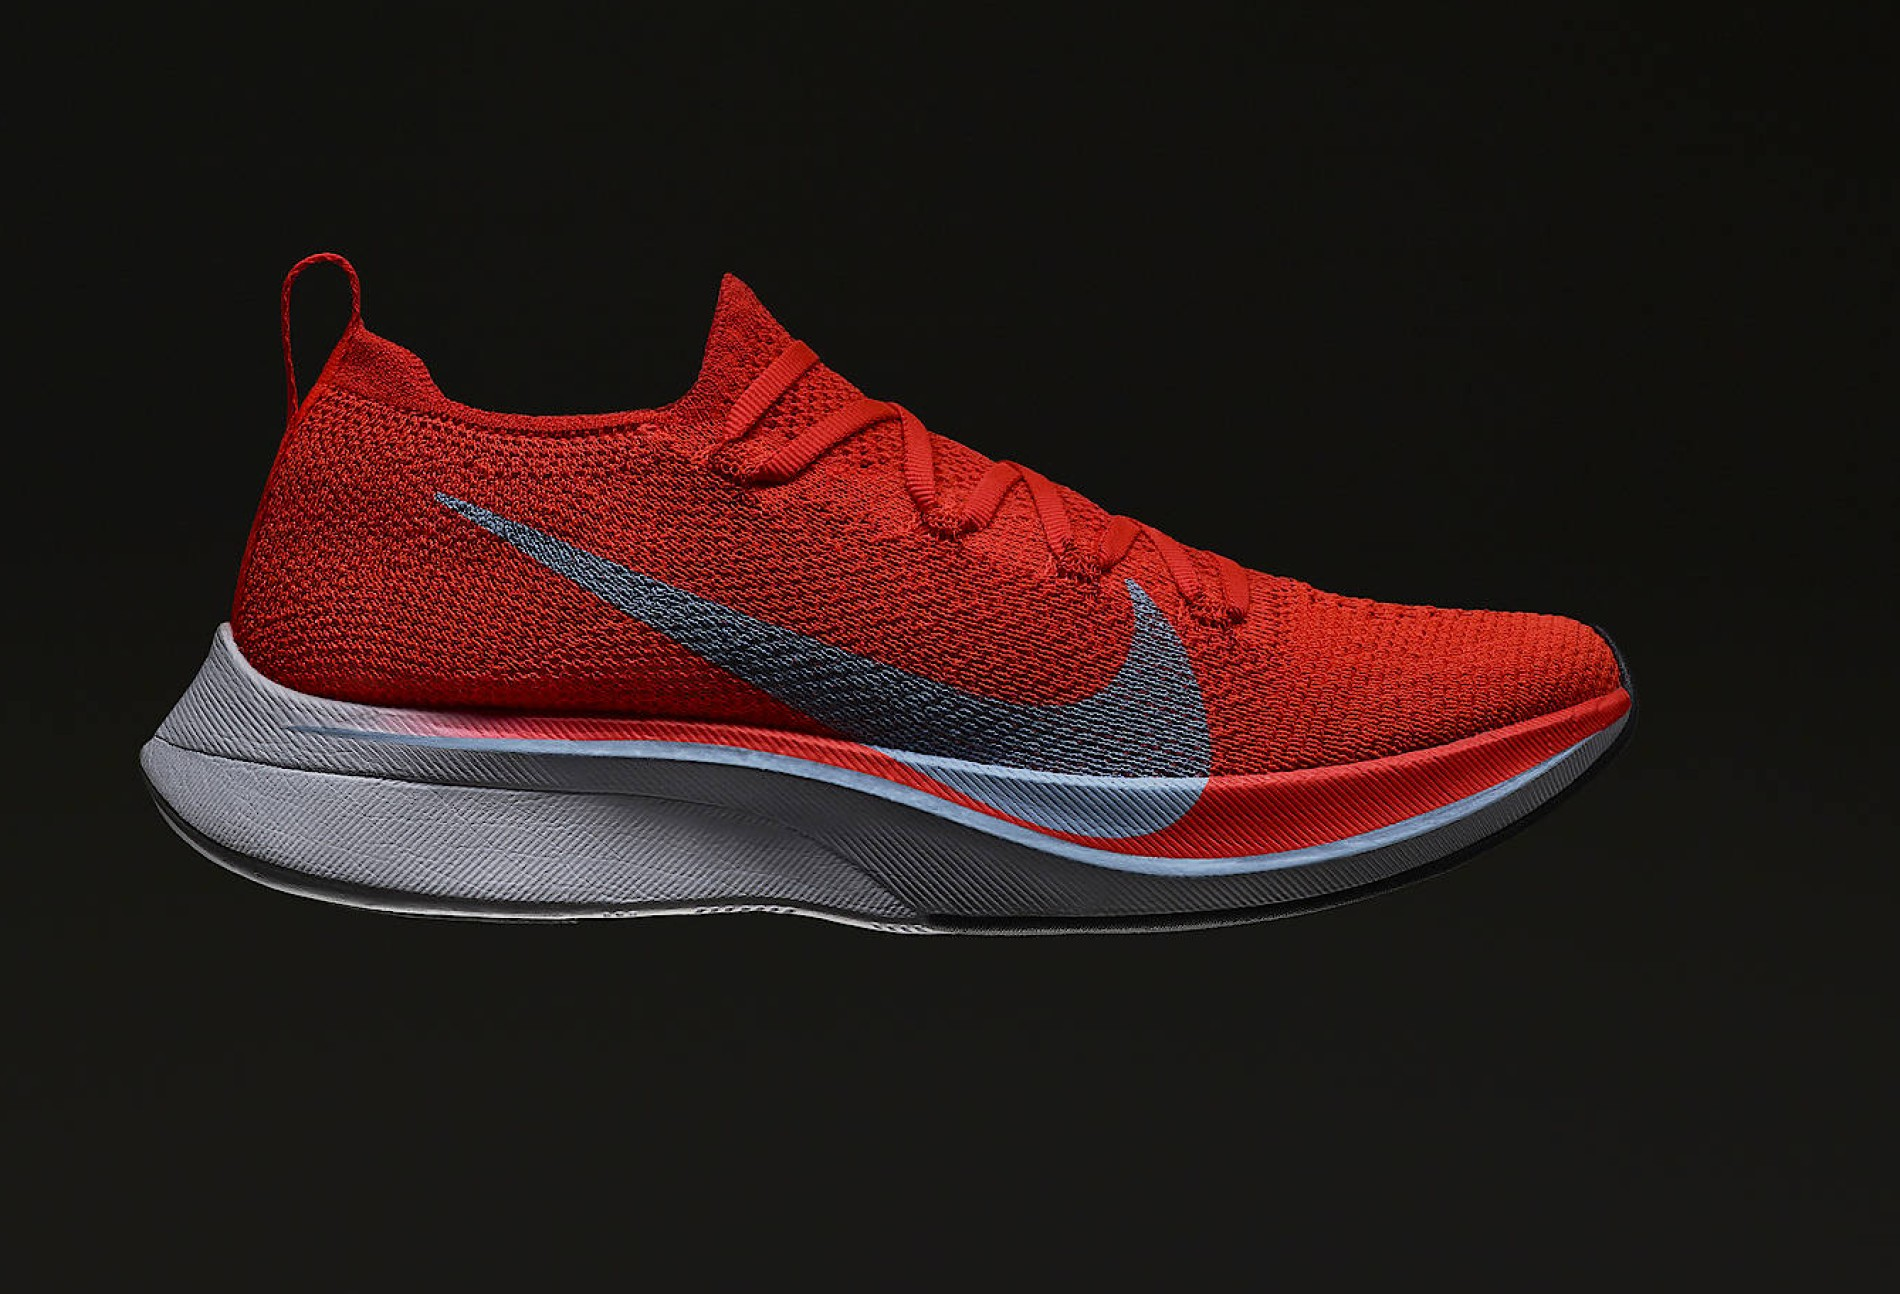 Nike Zoom Vaporfly 4% Flyknit im Test